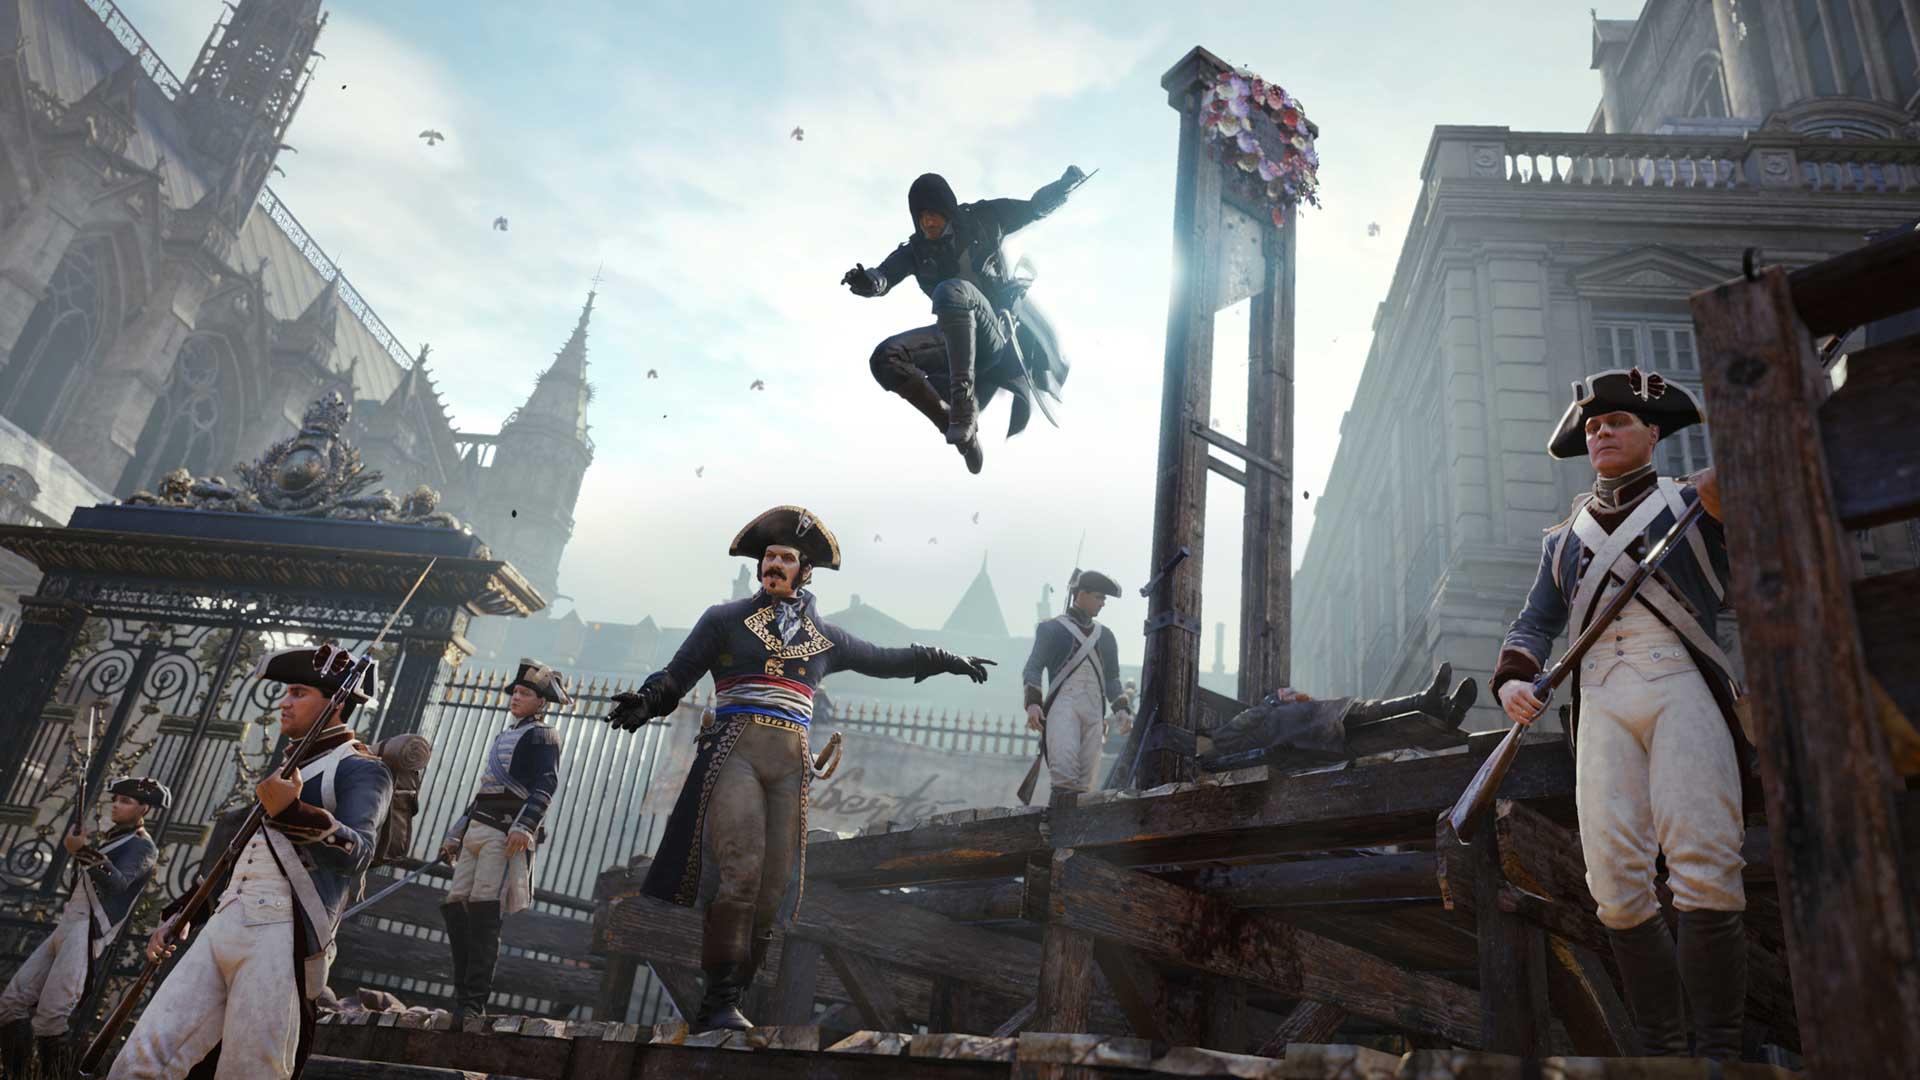 [FIXO] Assassin's Creed Unity ACU-media-SS-11-big_147460